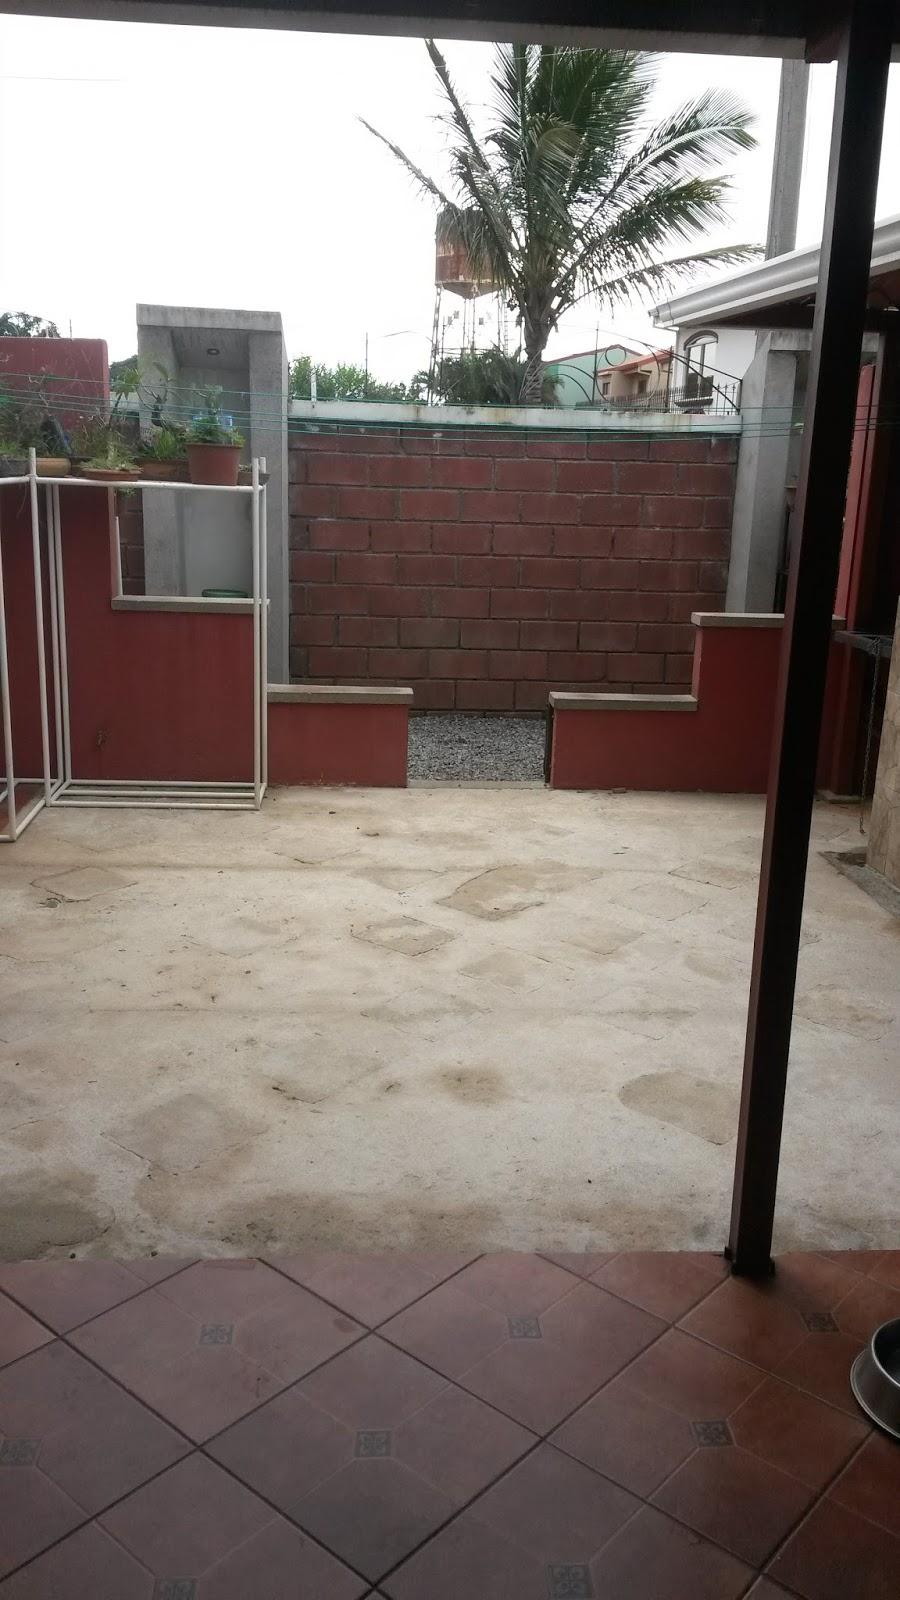 Mpaniagua Bienes Raices 0075003 Casa Santa Rosa Santo